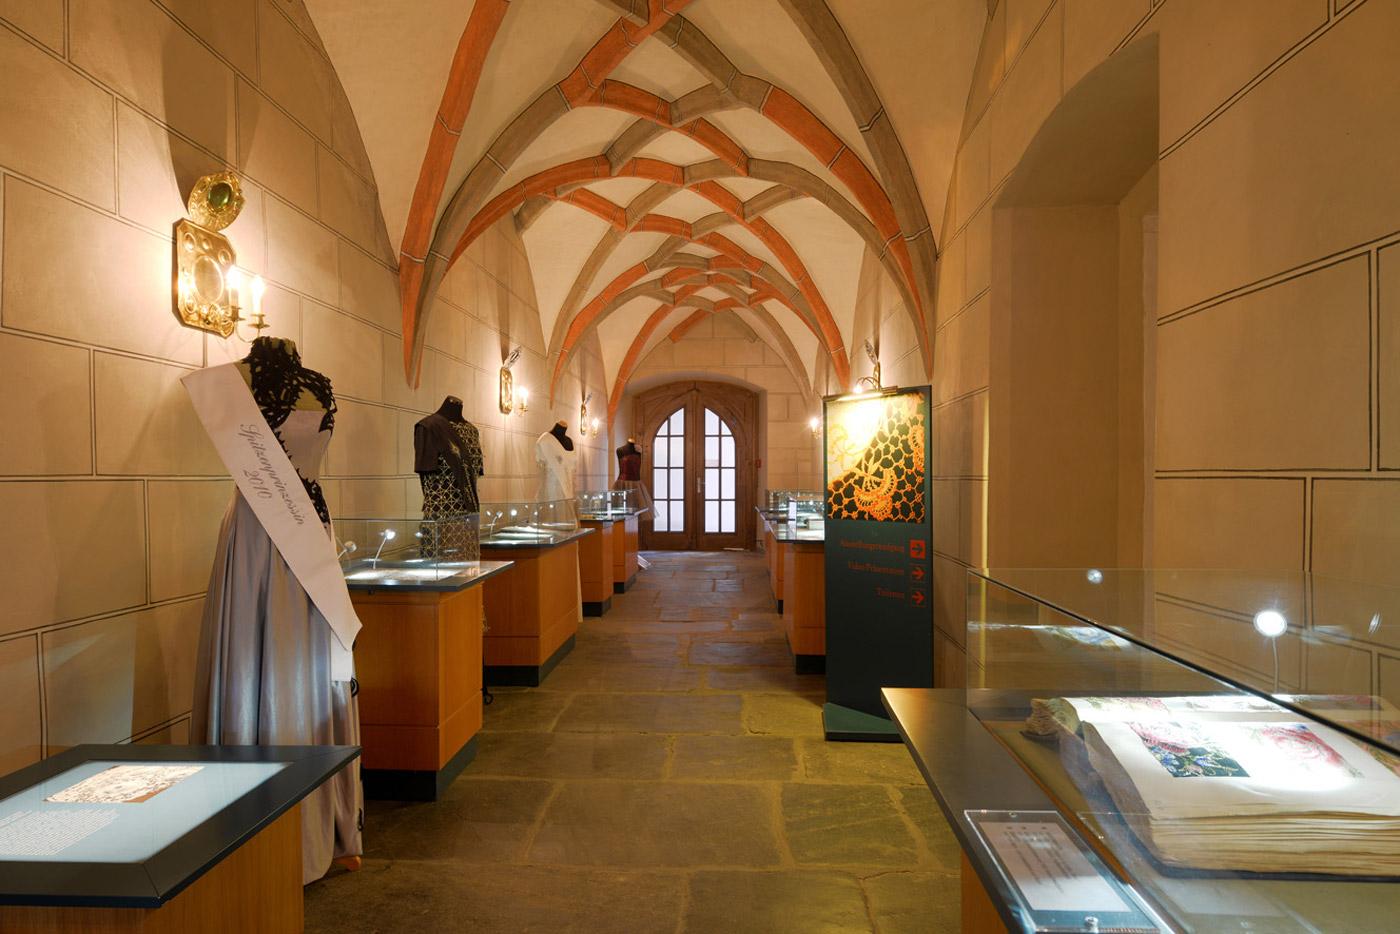 De mooiste steden in Saksen - Plauen